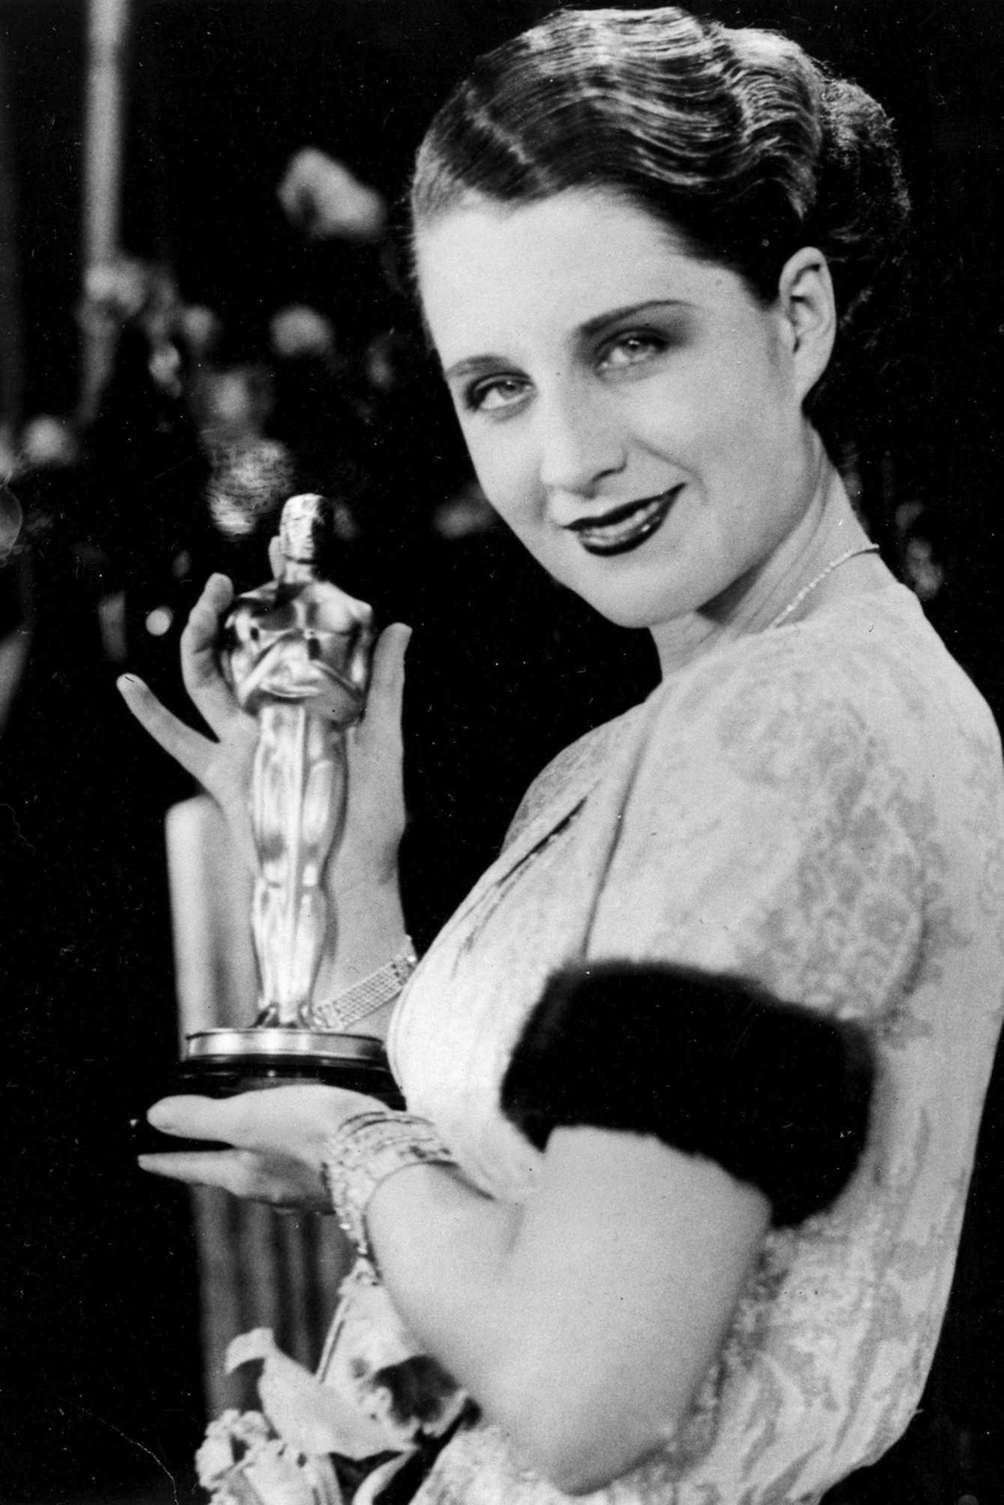 1929/30 - Norma Shearer - The Divorcee Actress